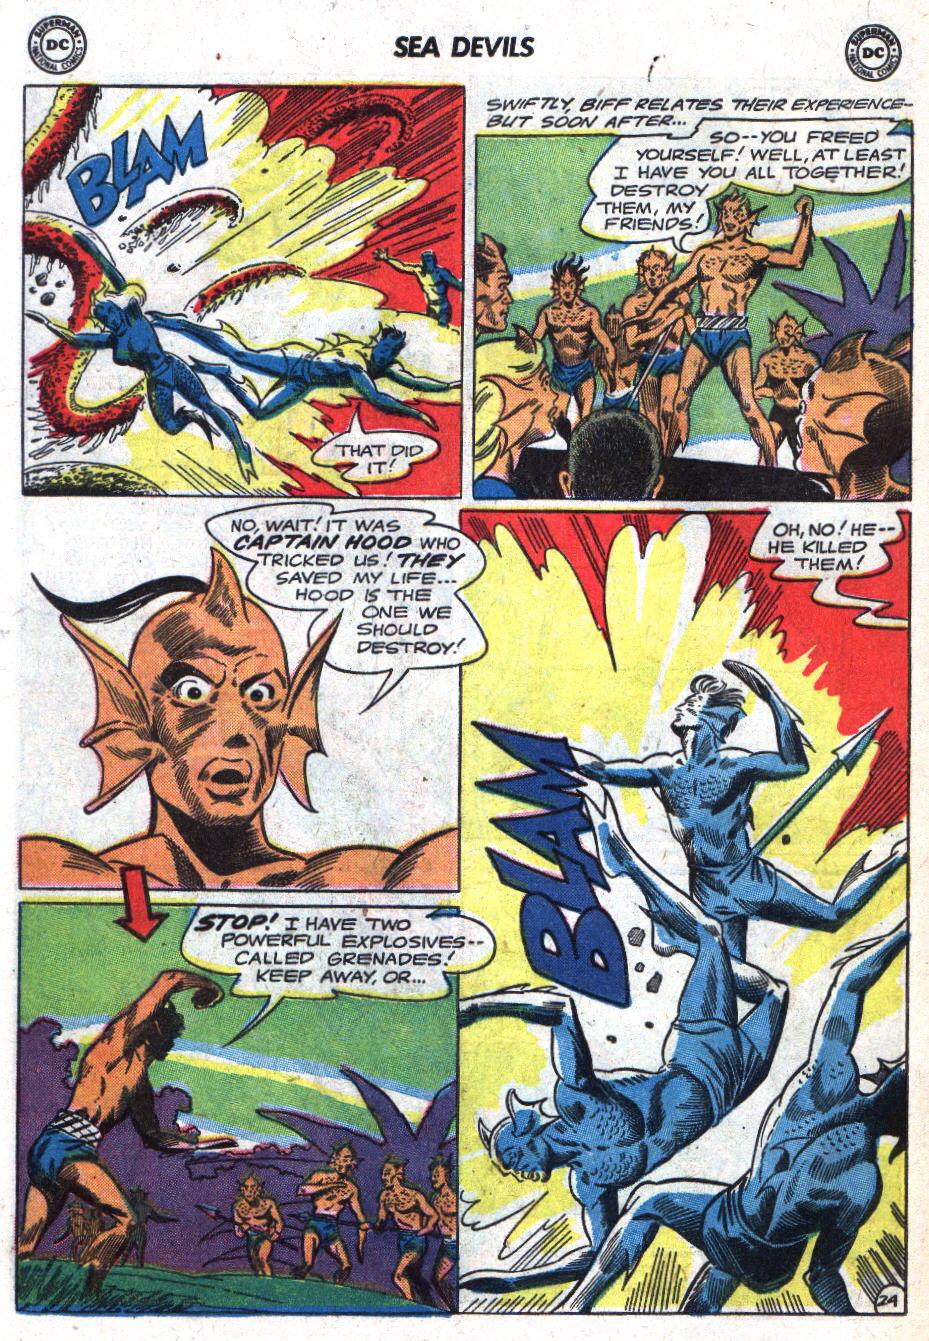 Read online Sea Devils comic -  Issue #18 - 32